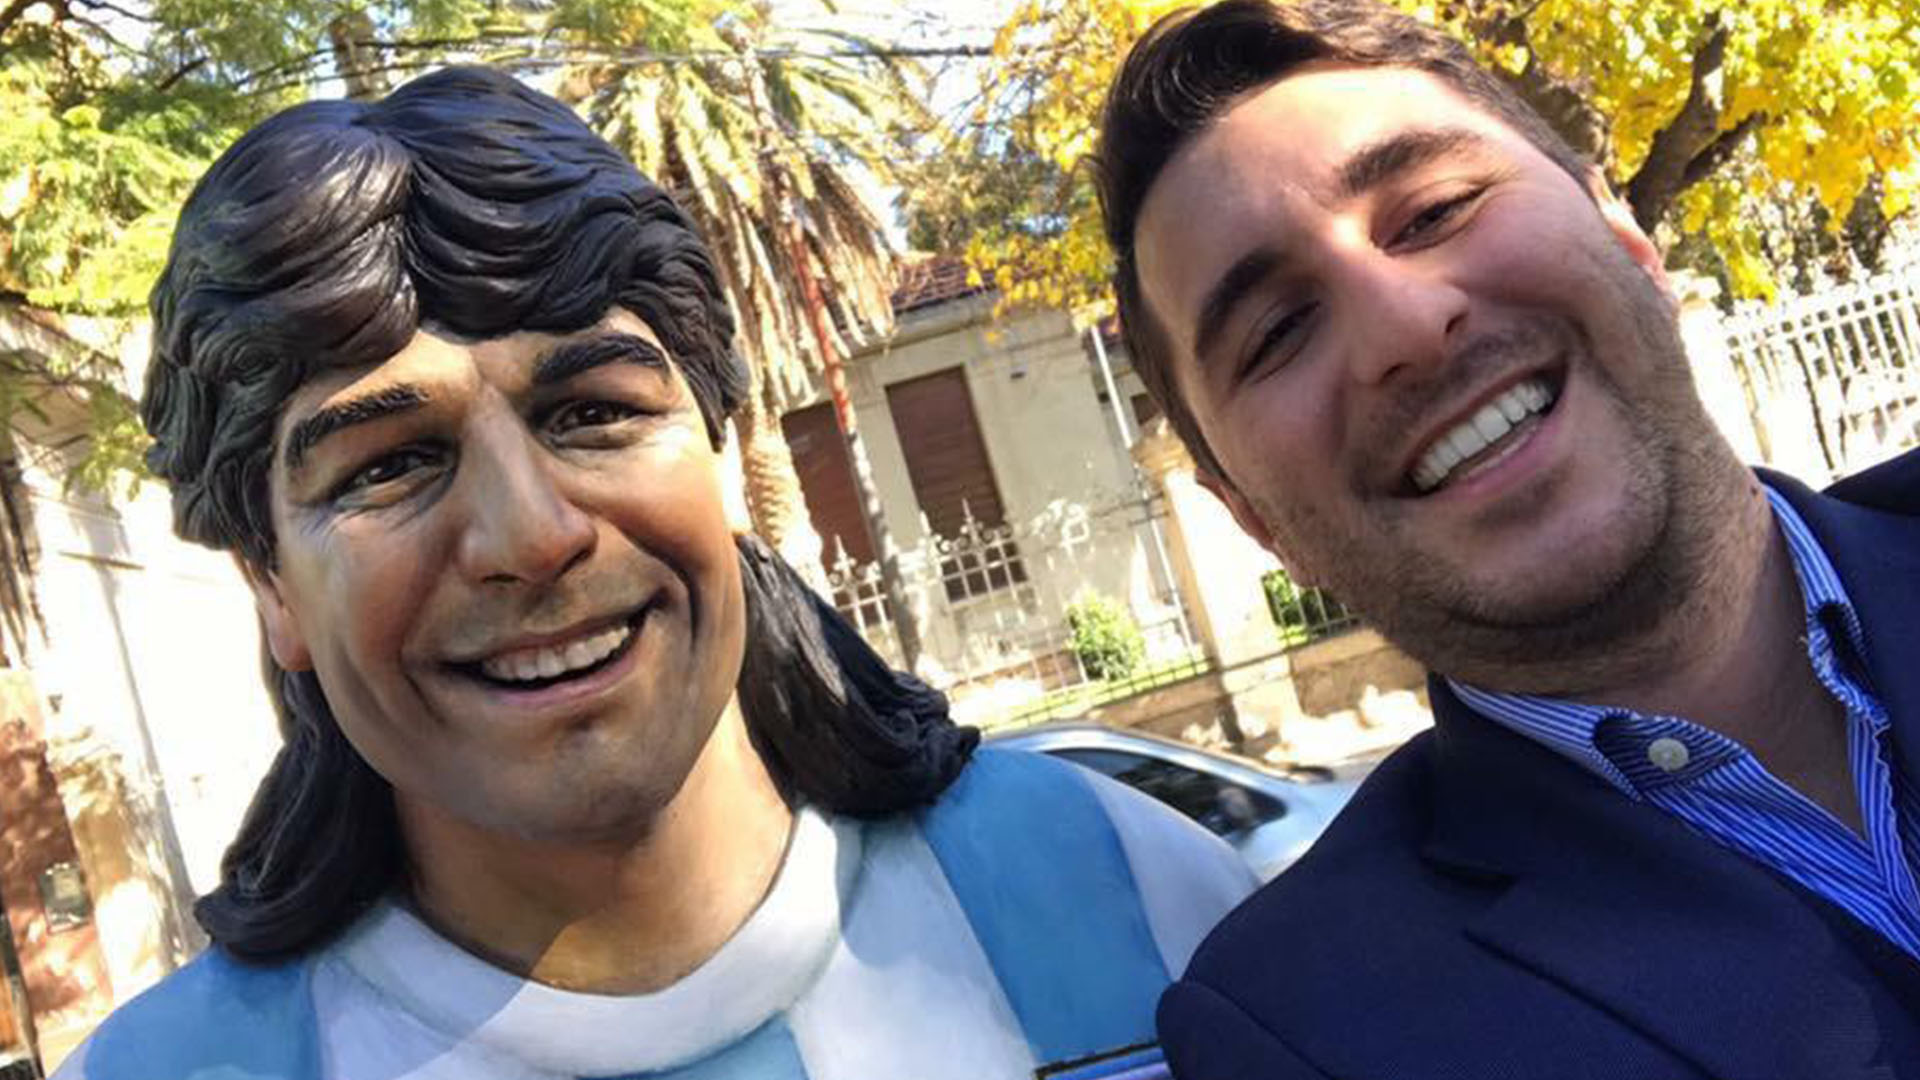 Juan Pablo Funes junto a la estatua de su padre